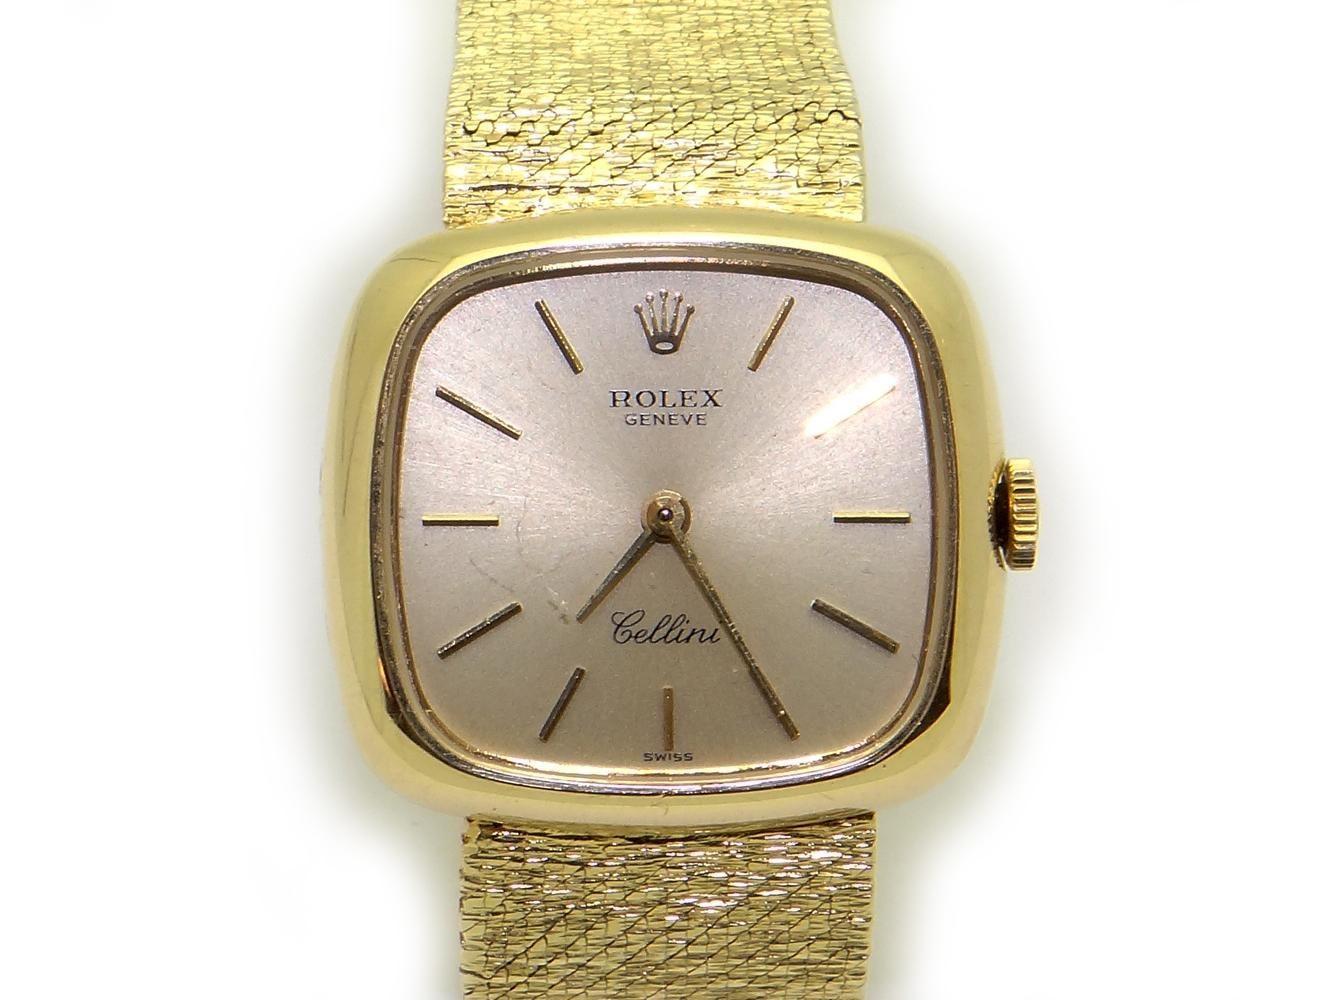 Vintage rolex cellini k yellow gold manual wind cushion bracelet